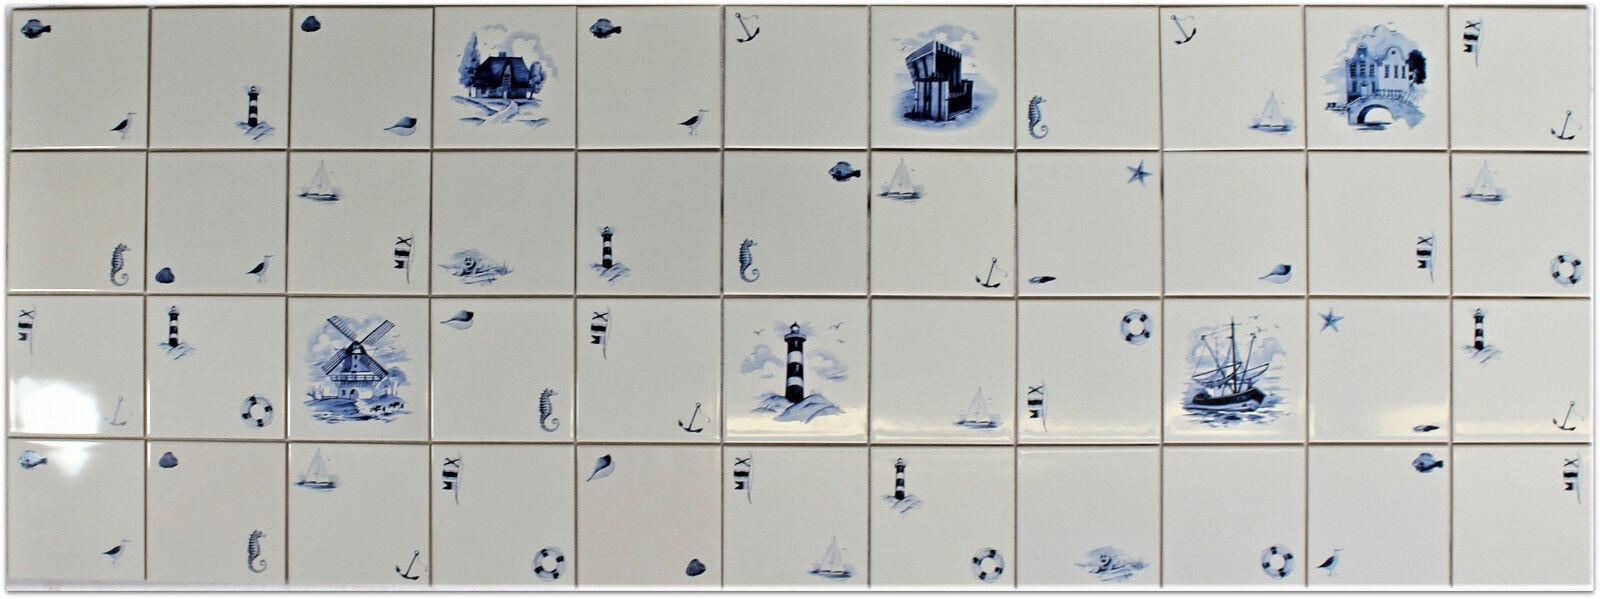 1 qm (m²) 15x15 Küchenfliesen Fliesenspiegel Delfter Art, Leuchtturm Strandkorb